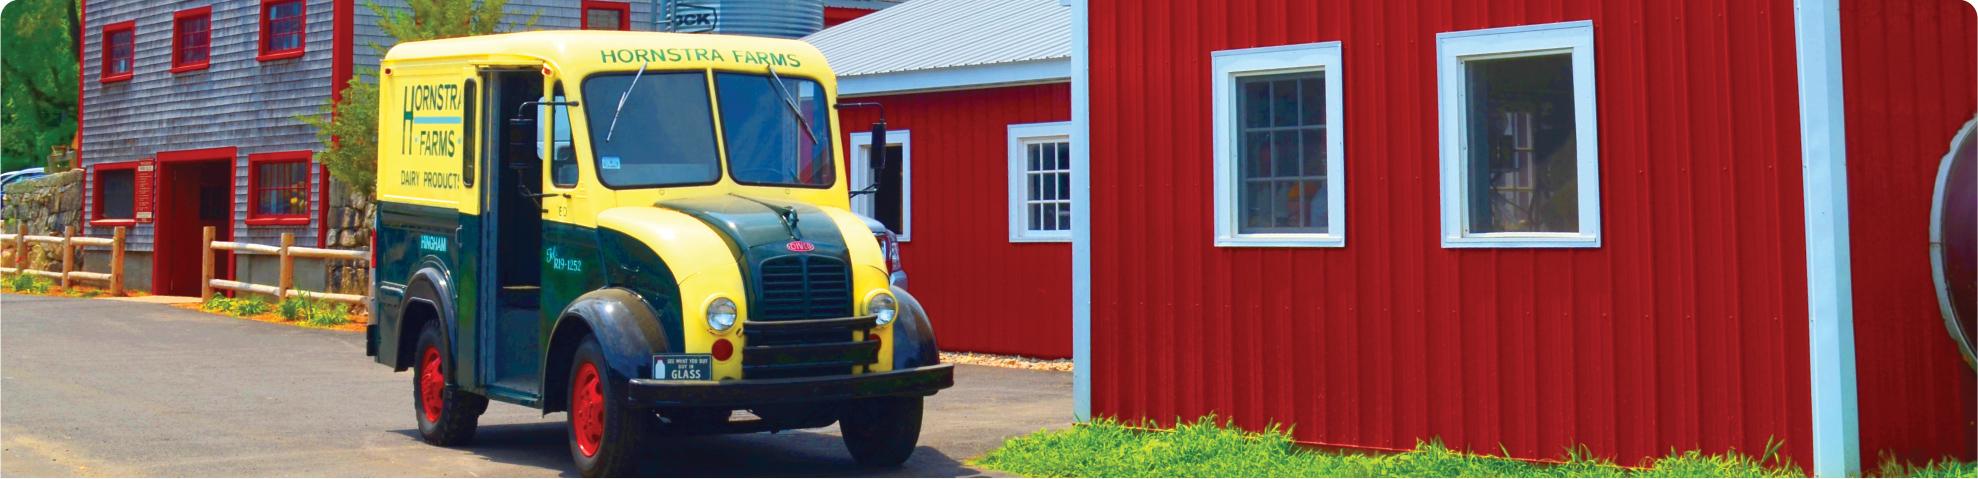 Hornstra Farms Hornstra Huisarts Bozum